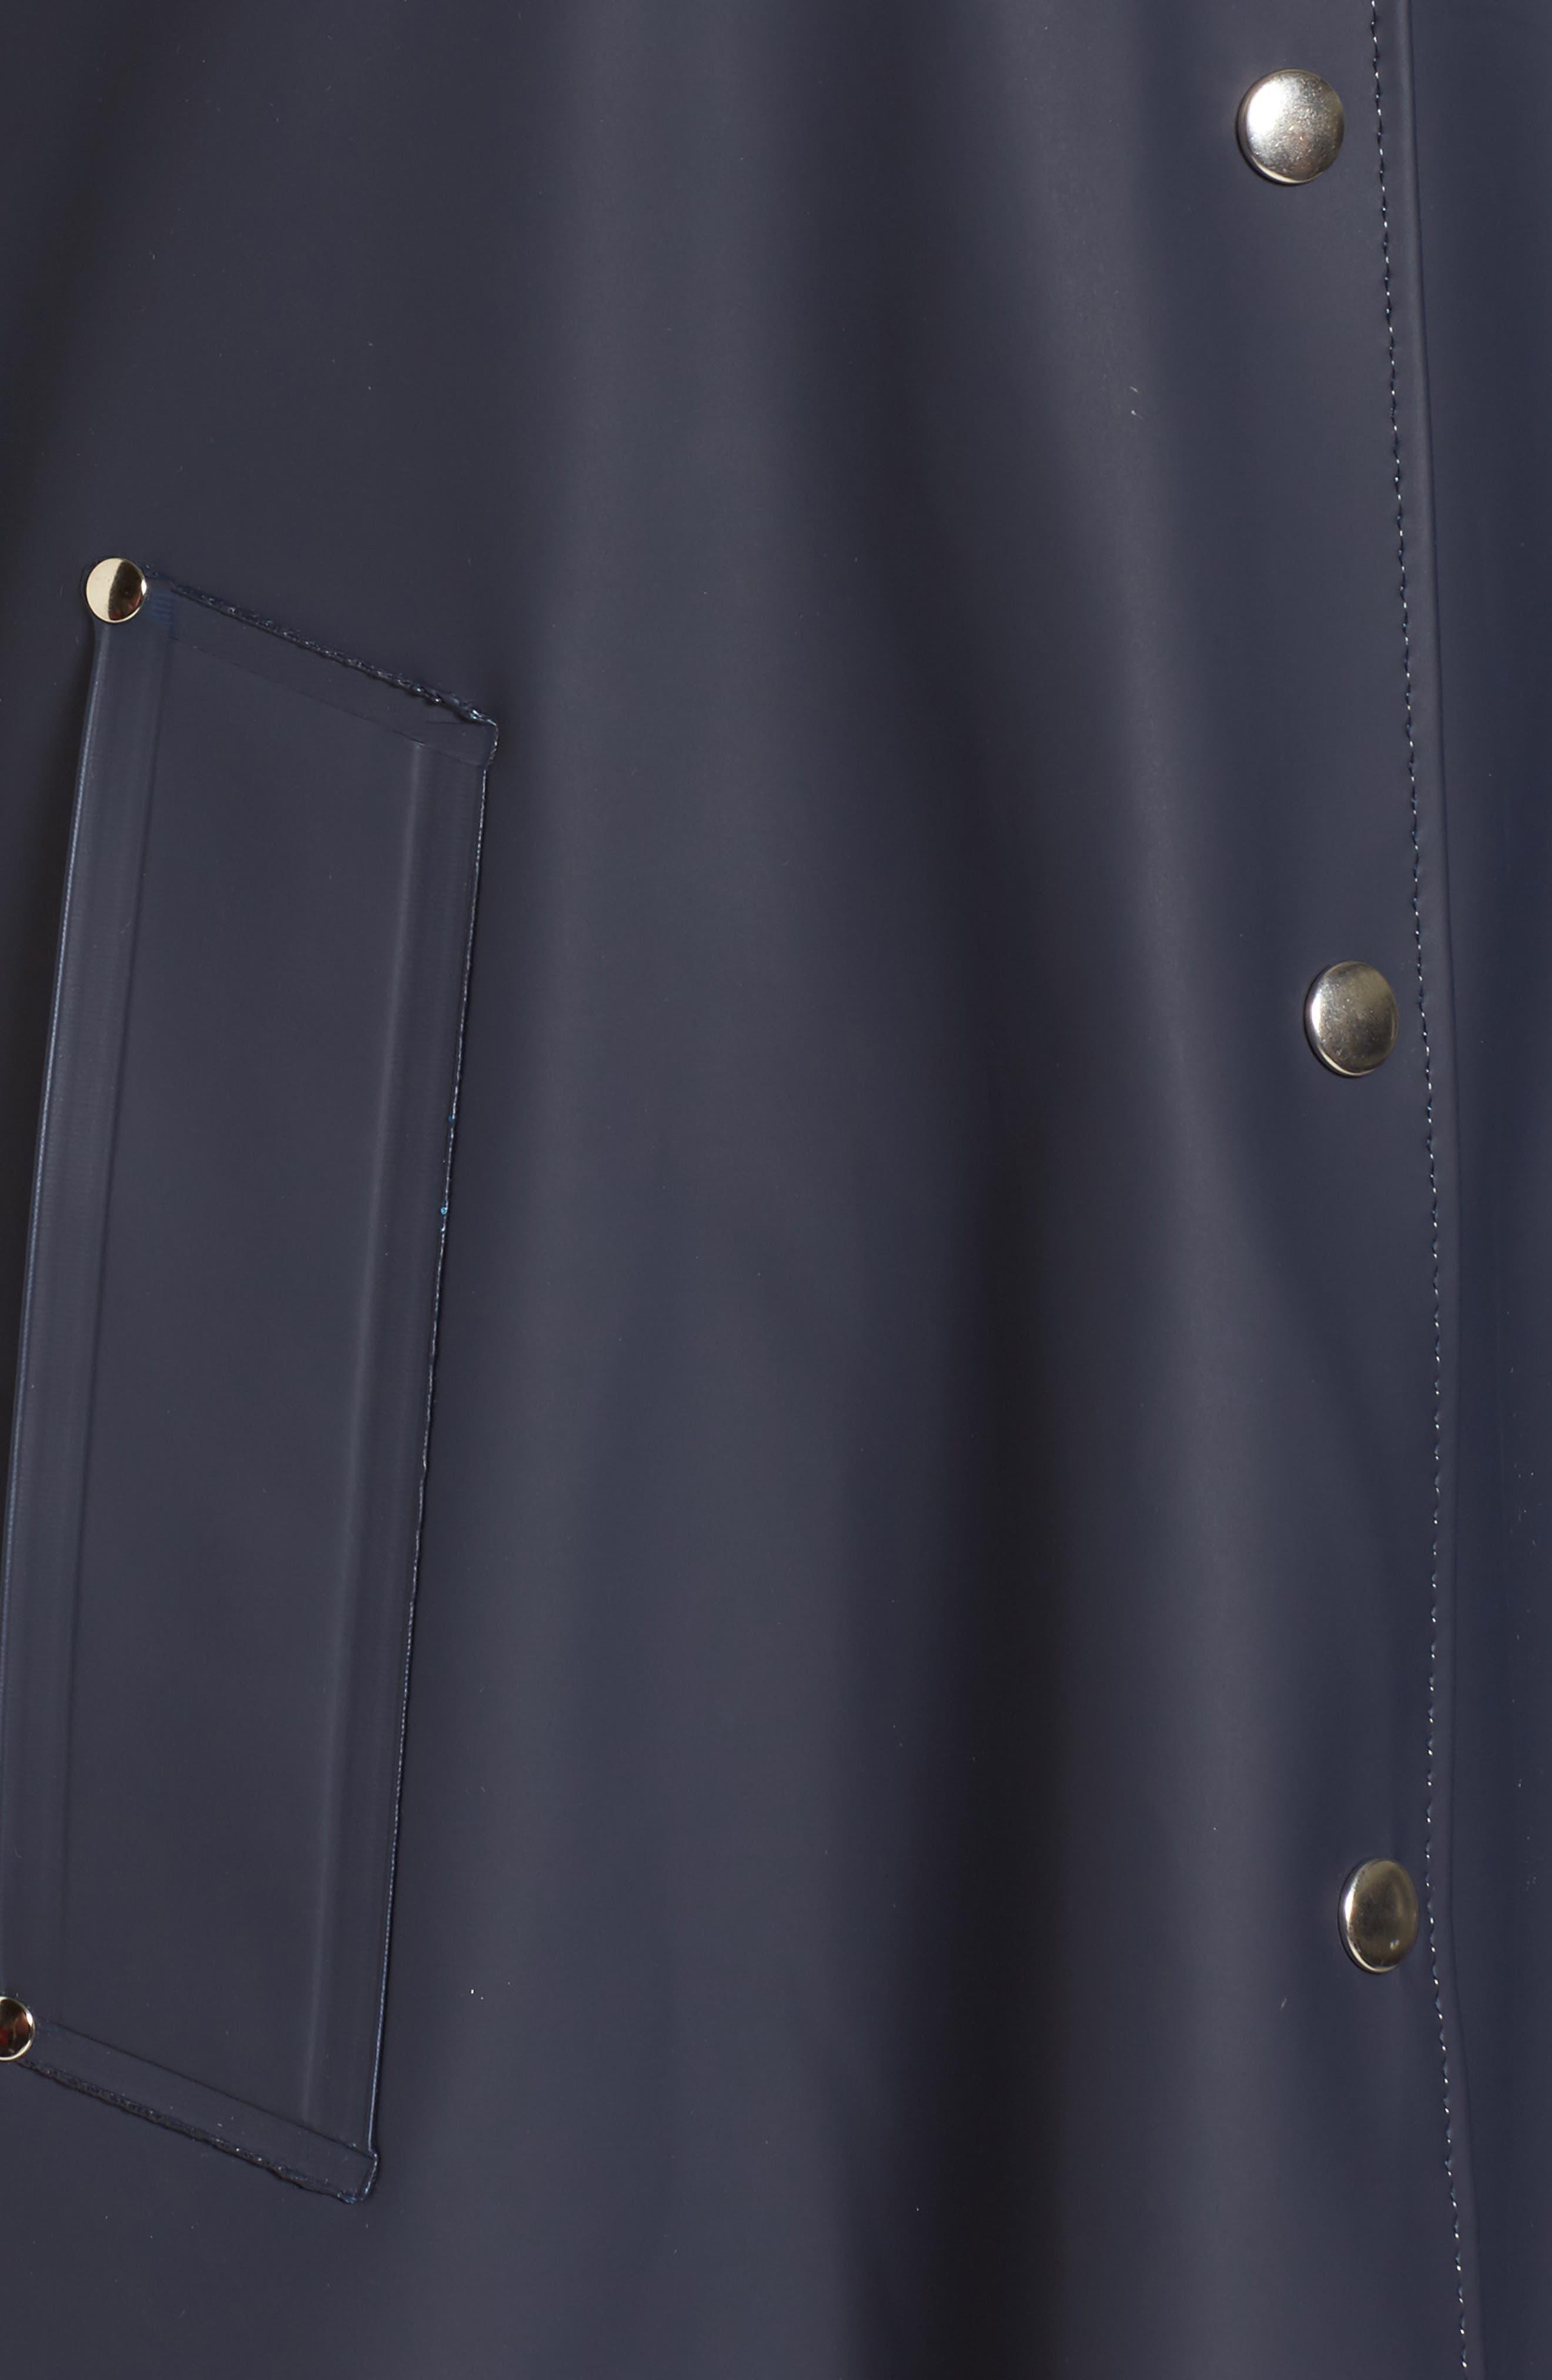 Mosebacke Frame Colorblock Raincoat,                             Alternate thumbnail 5, color,                             Navy/ Faded Rose